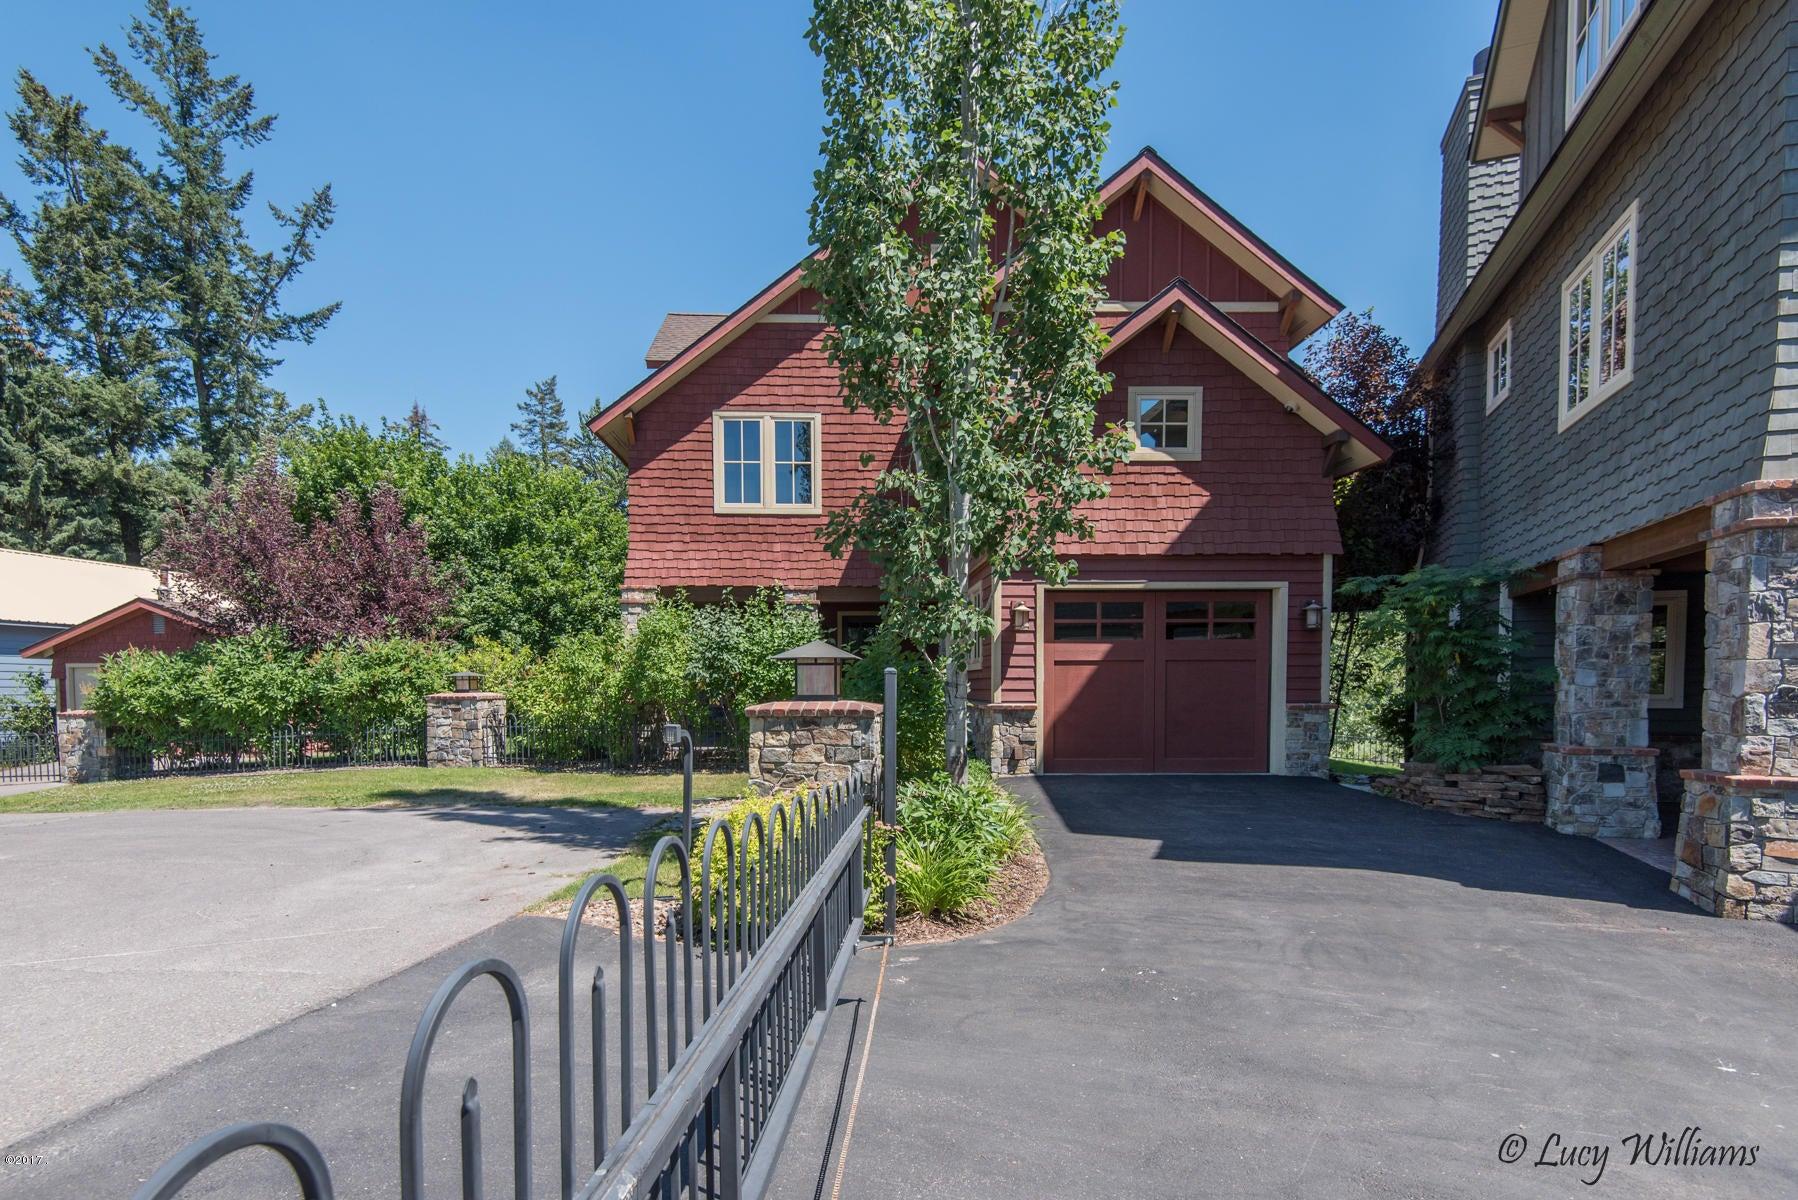 Additional photo for property listing at 214 River Street 214 River Street Bigfork, Montana 59911 United States